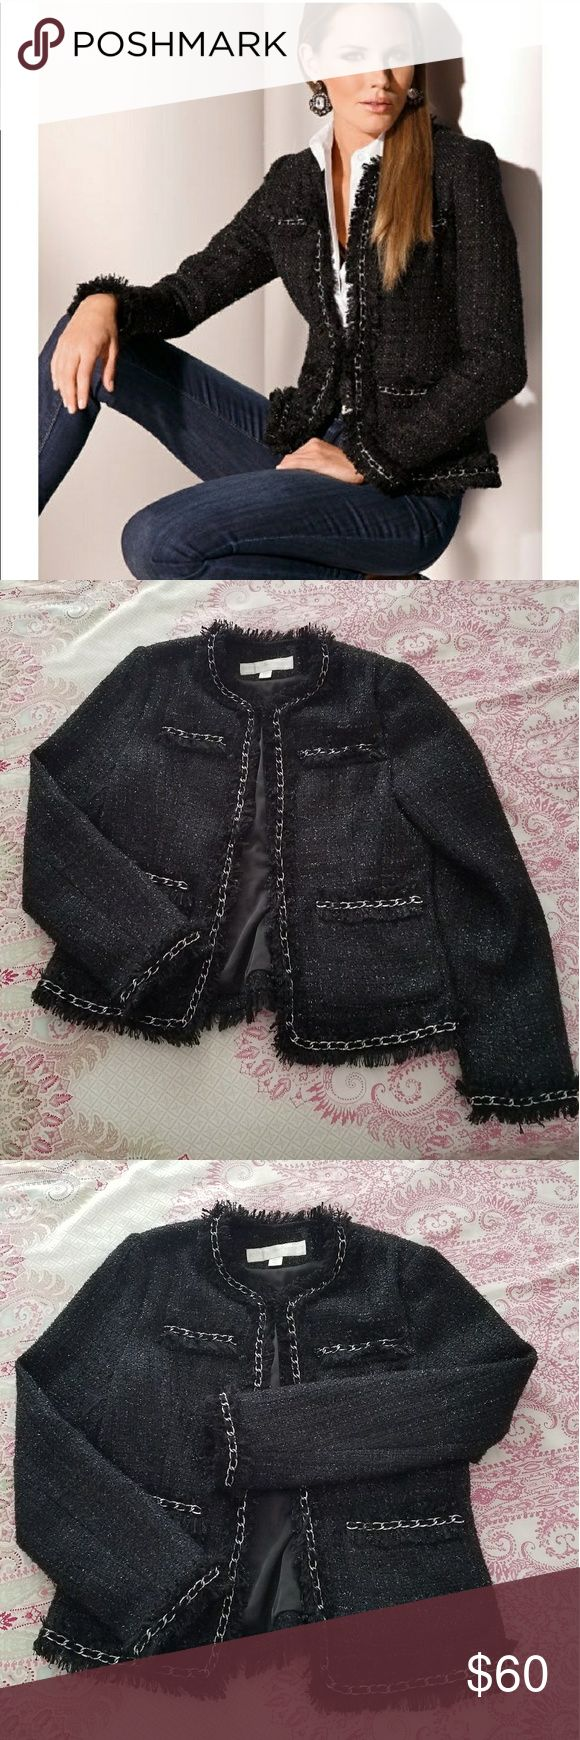 Boston Proper Parisian Jacket with chain Black tweed Boston Proper jacket with silver chain accent. Boston Proper Jackets & Coats Blazers